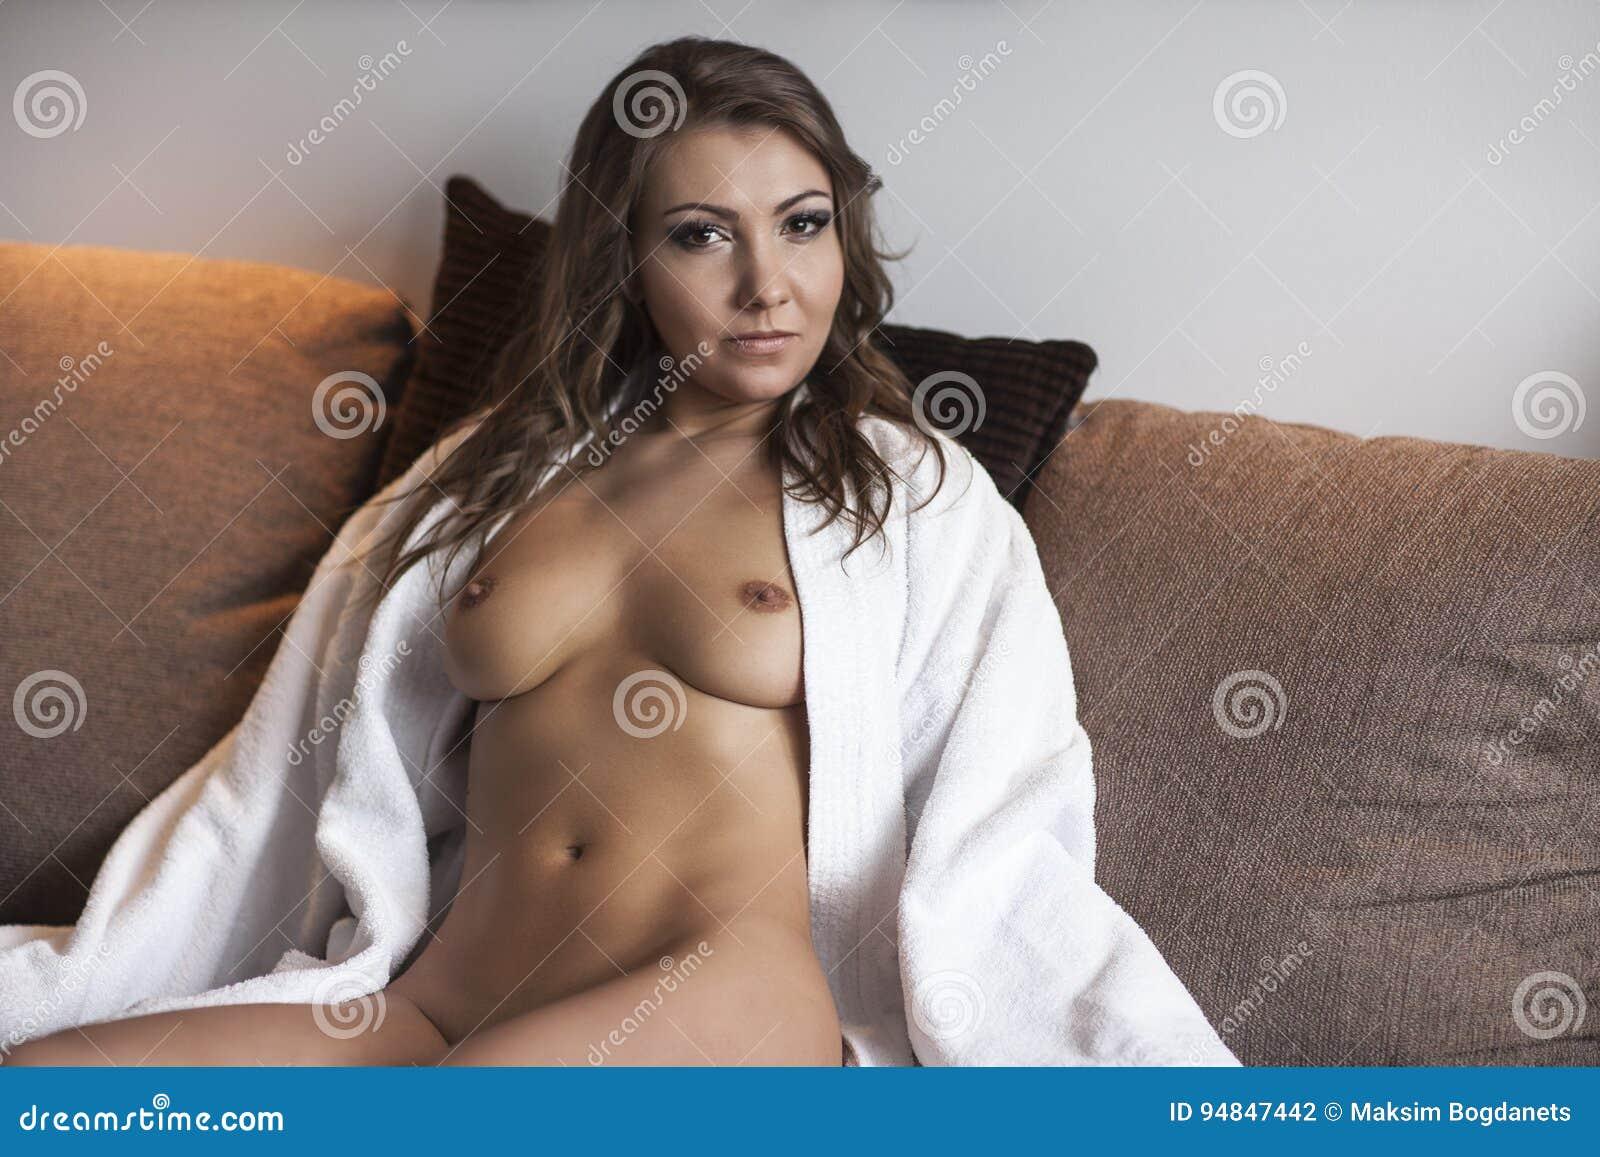 hausfrau nackt fotos